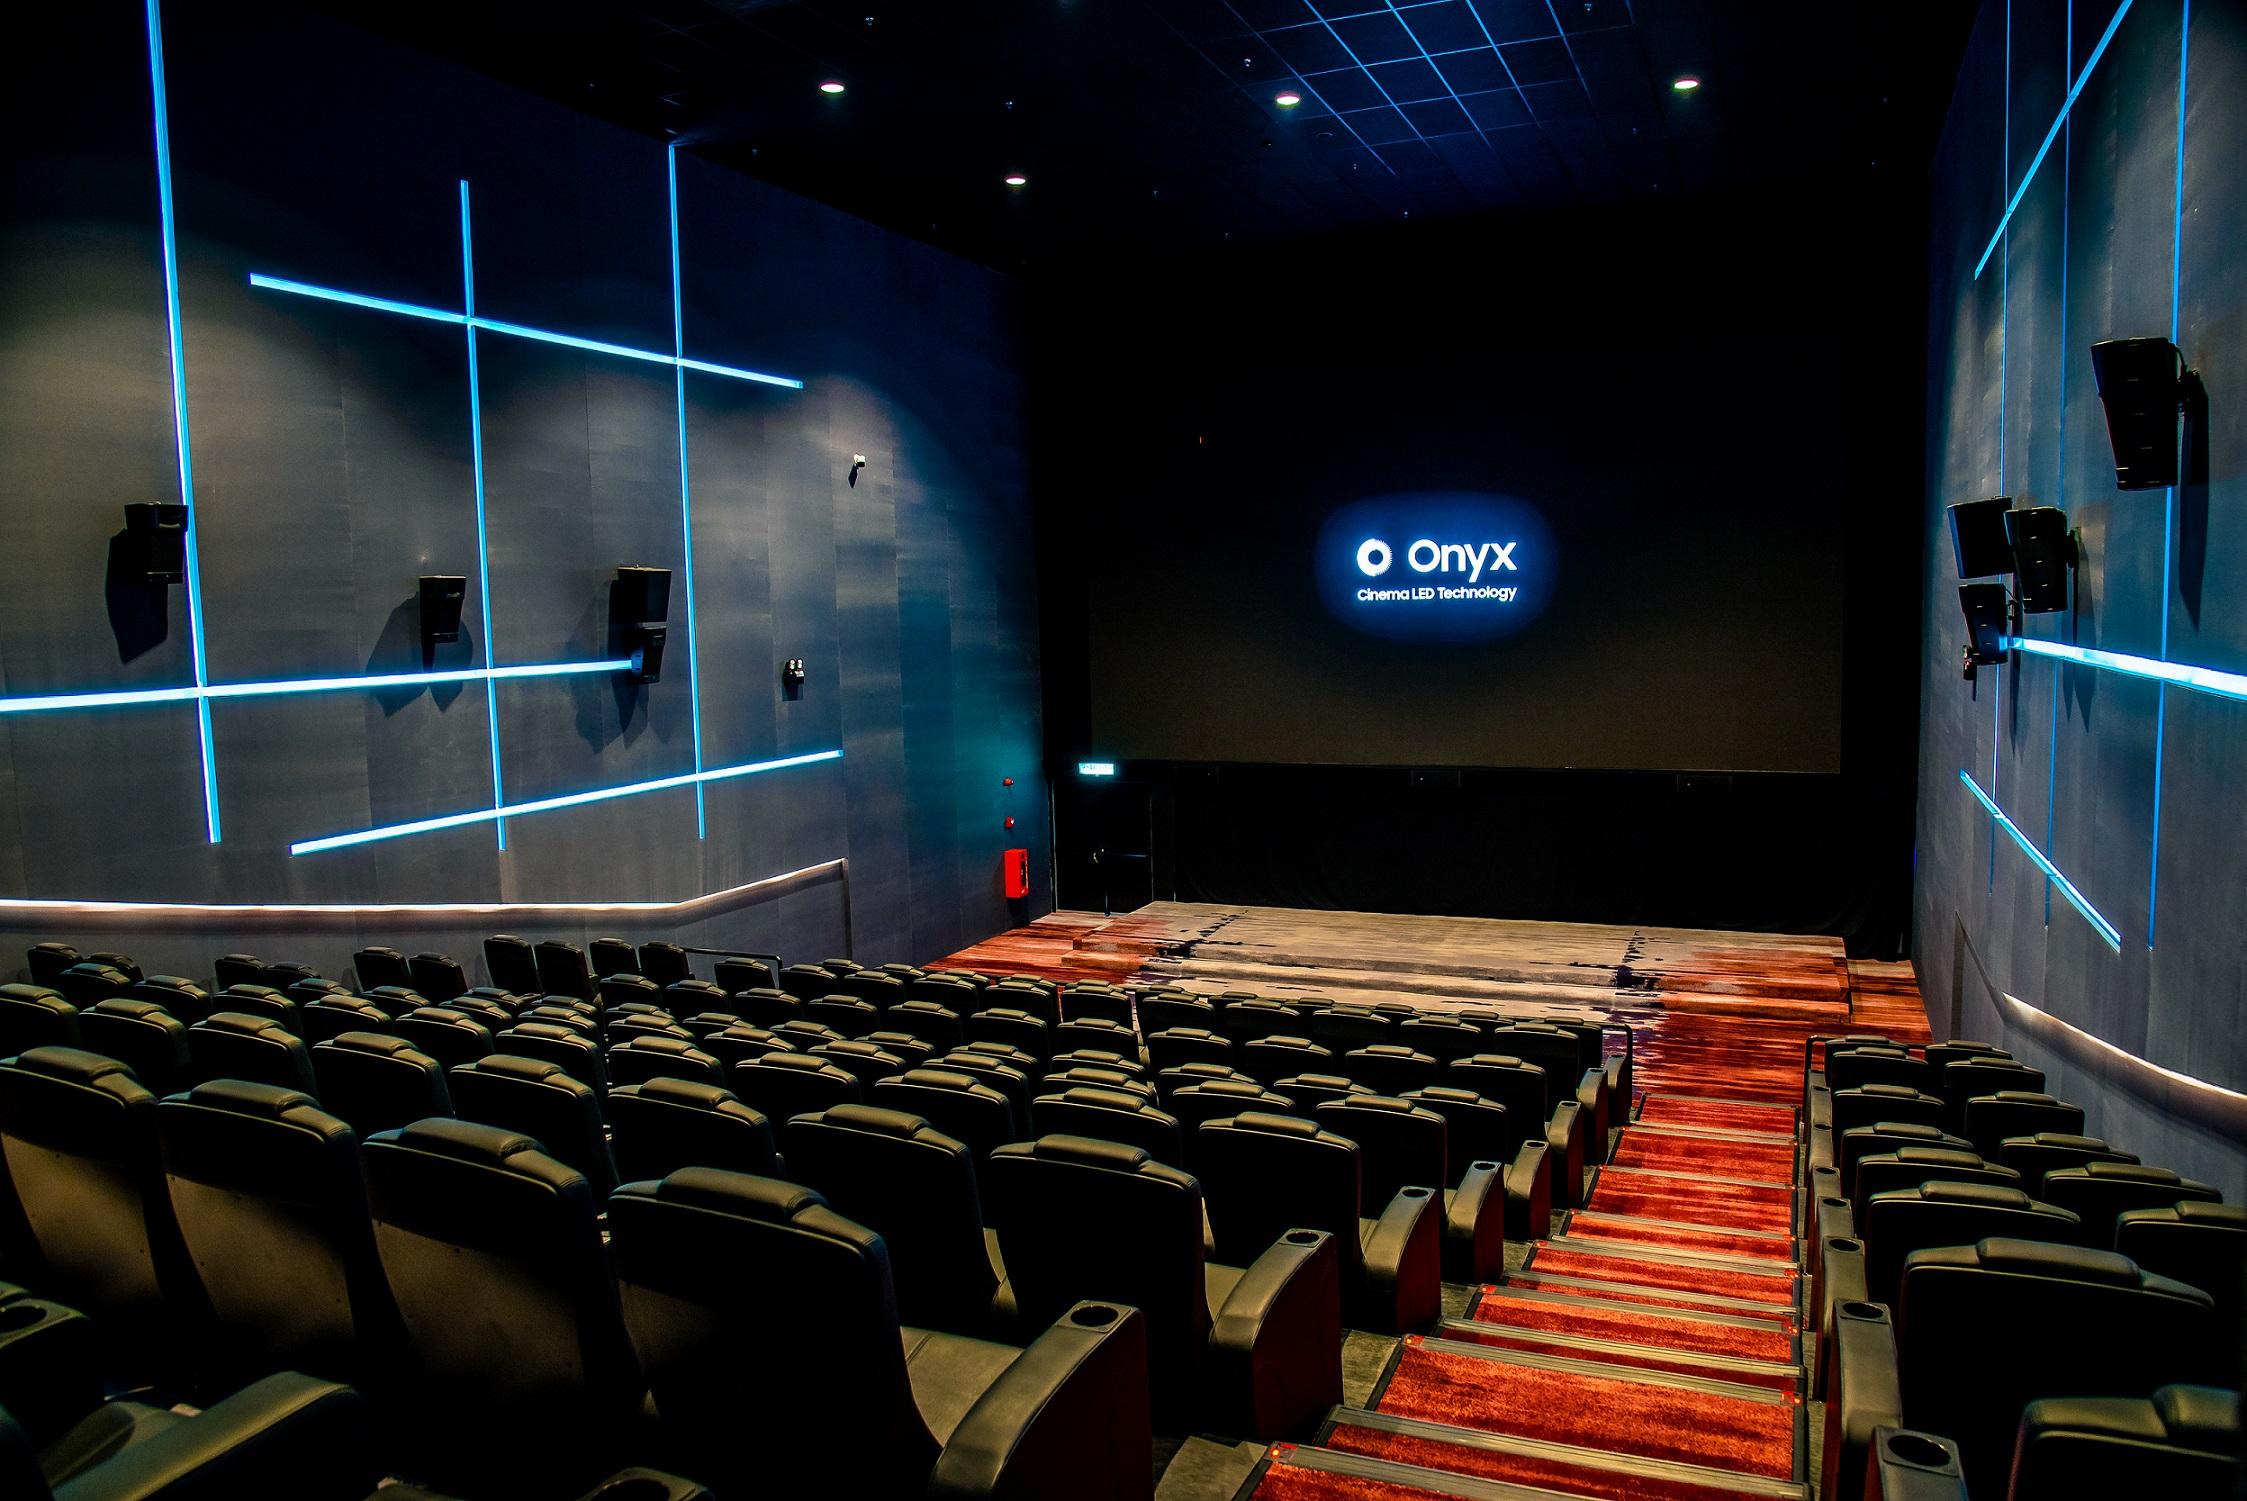 Press Release Mbo Cinemas Introduces Samsung Onyx Cinema Led